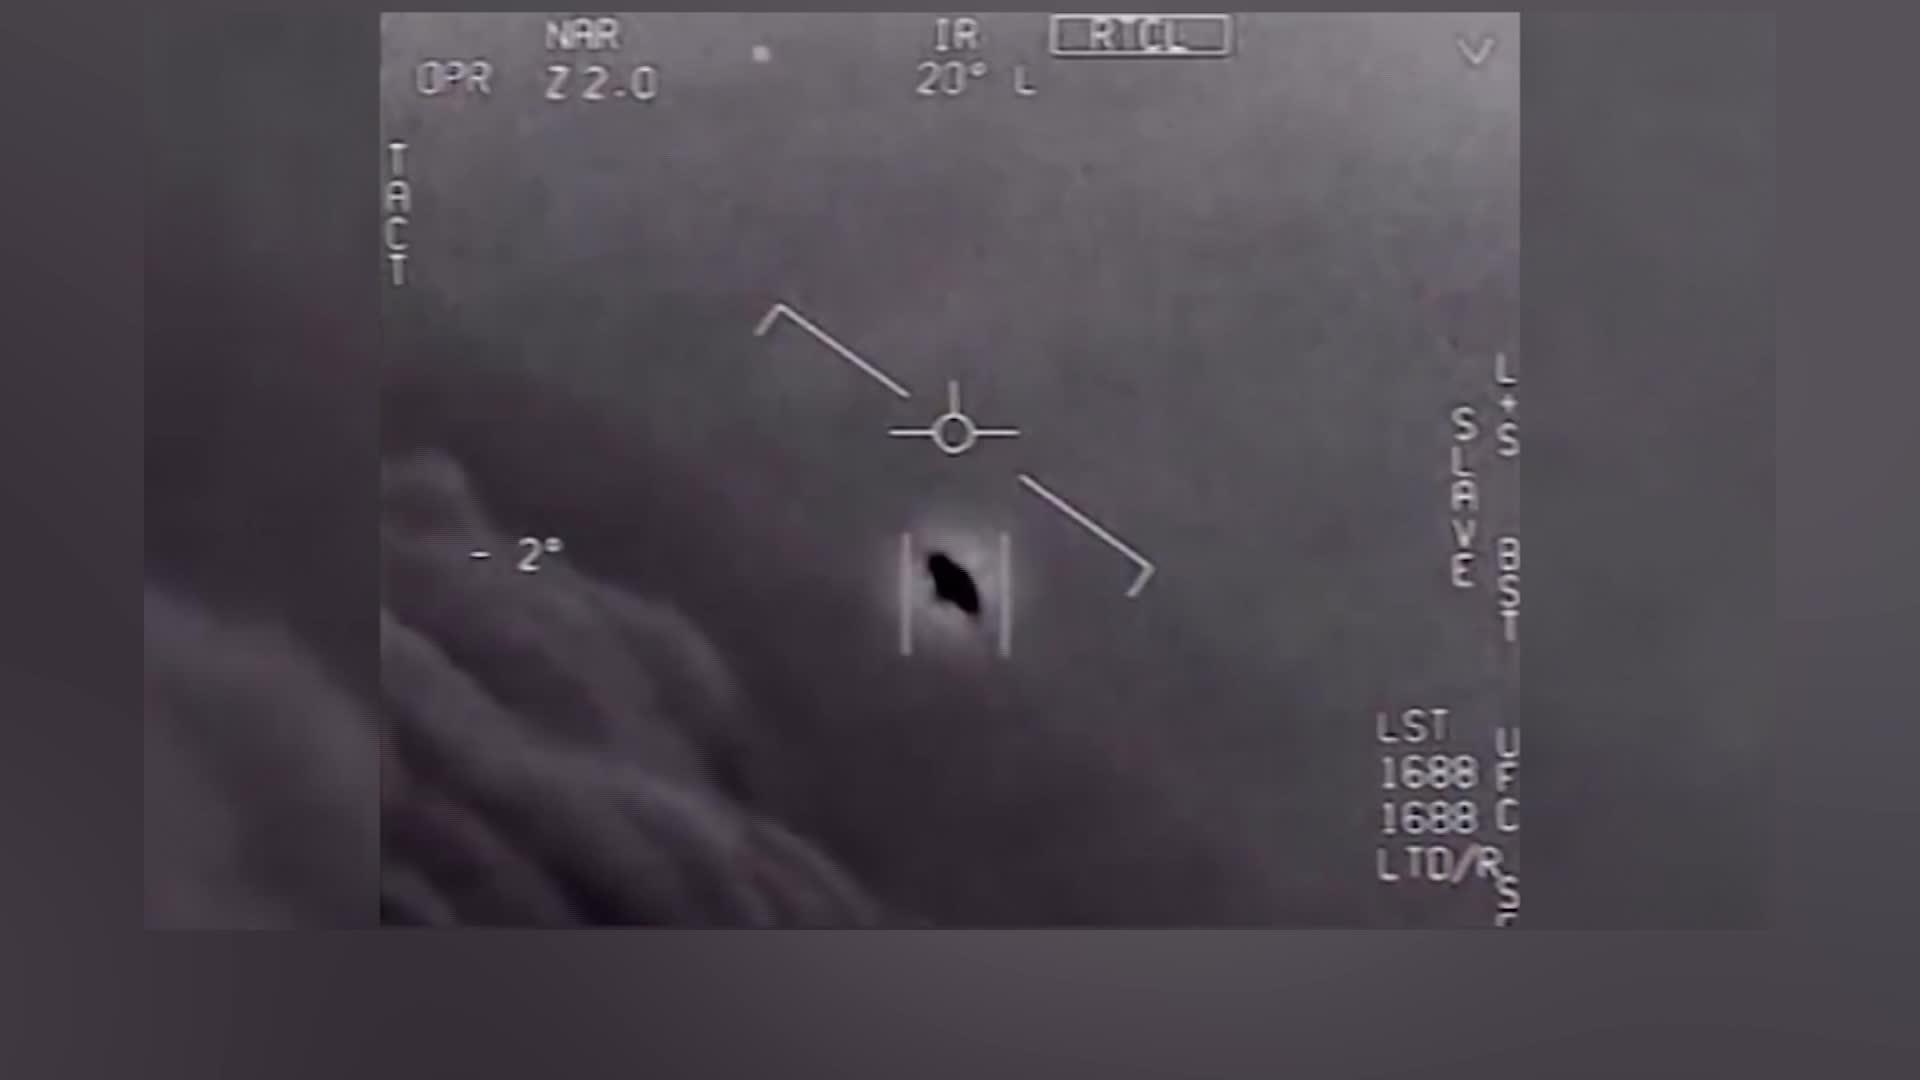 This image shows a possible UFO, according to U.S. officials. (U.S. Defense Department via CNN)